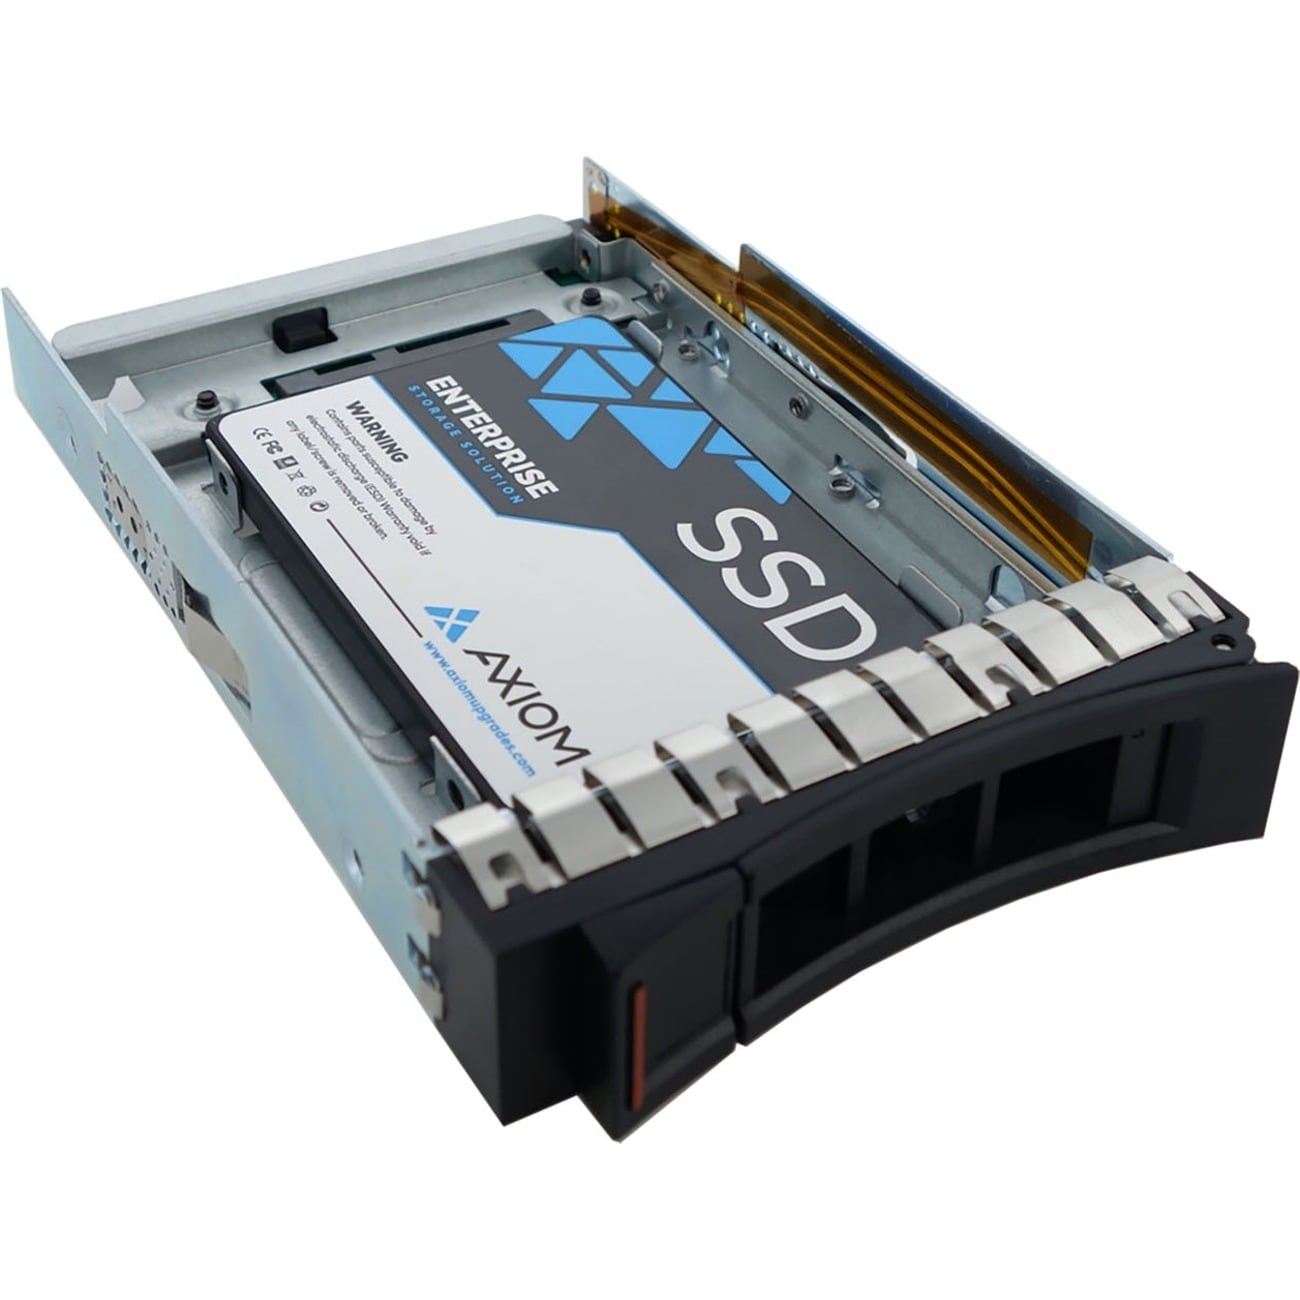 "Axiom 200 GB 3.5"" Internal Solid State Drive #SSDEV30ID20..."